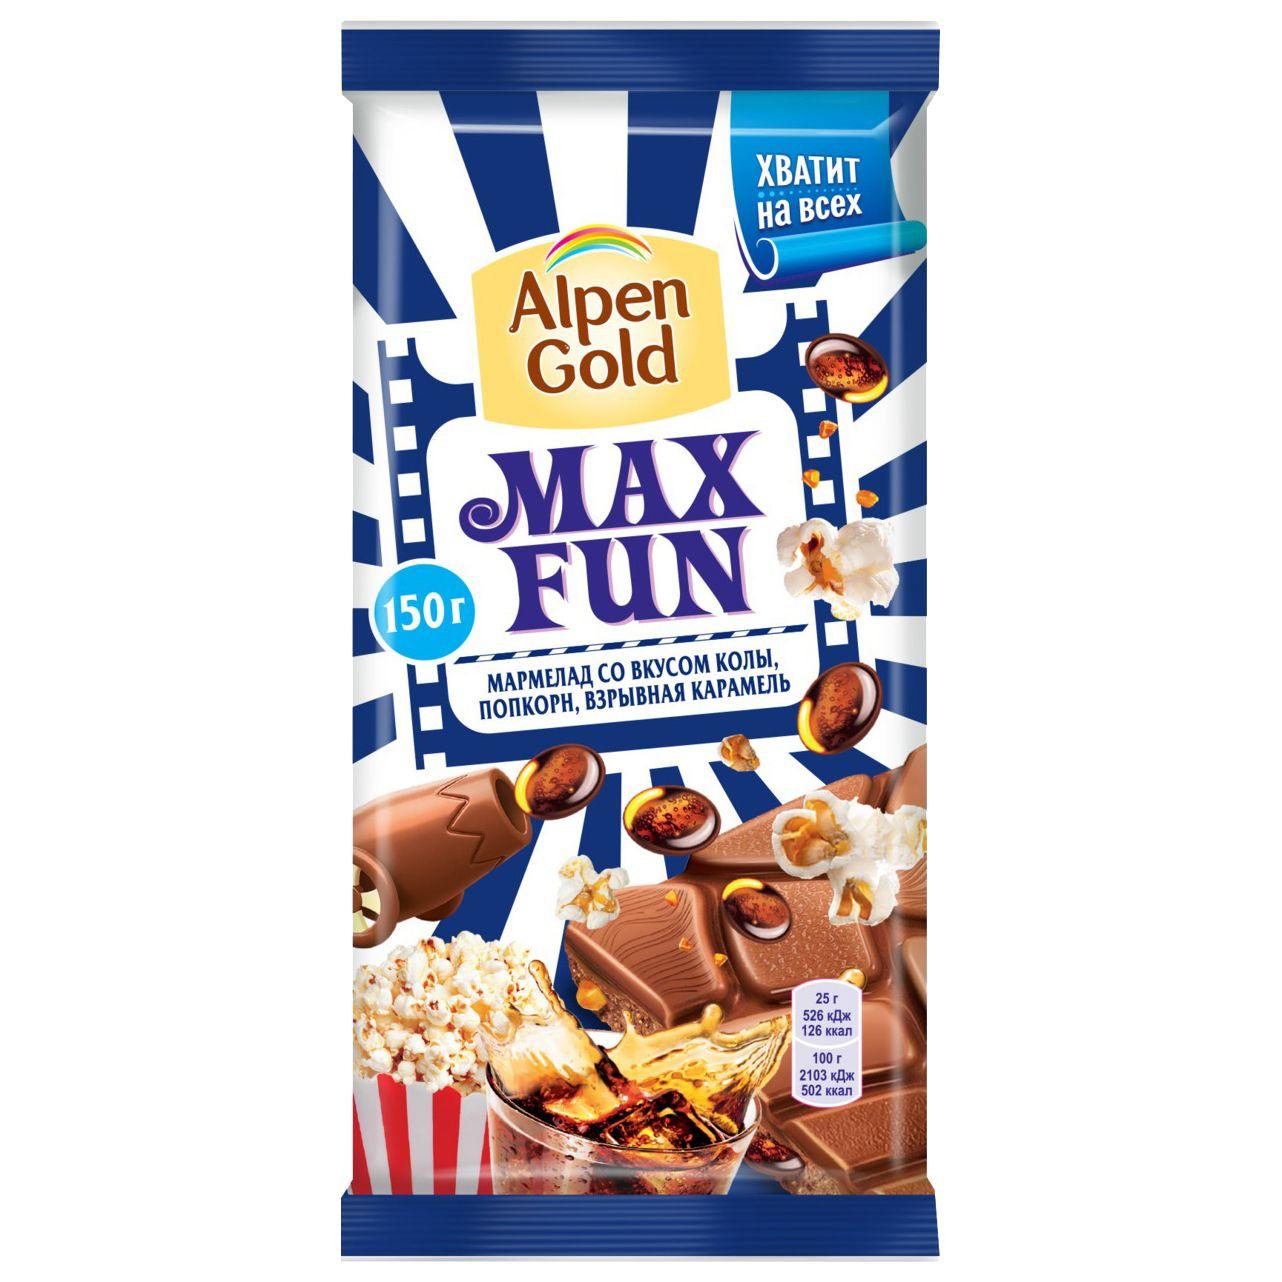 Шоколад Максфан с марм. вкус колы/попкорн/взр.карам. 155г Alpen Gold